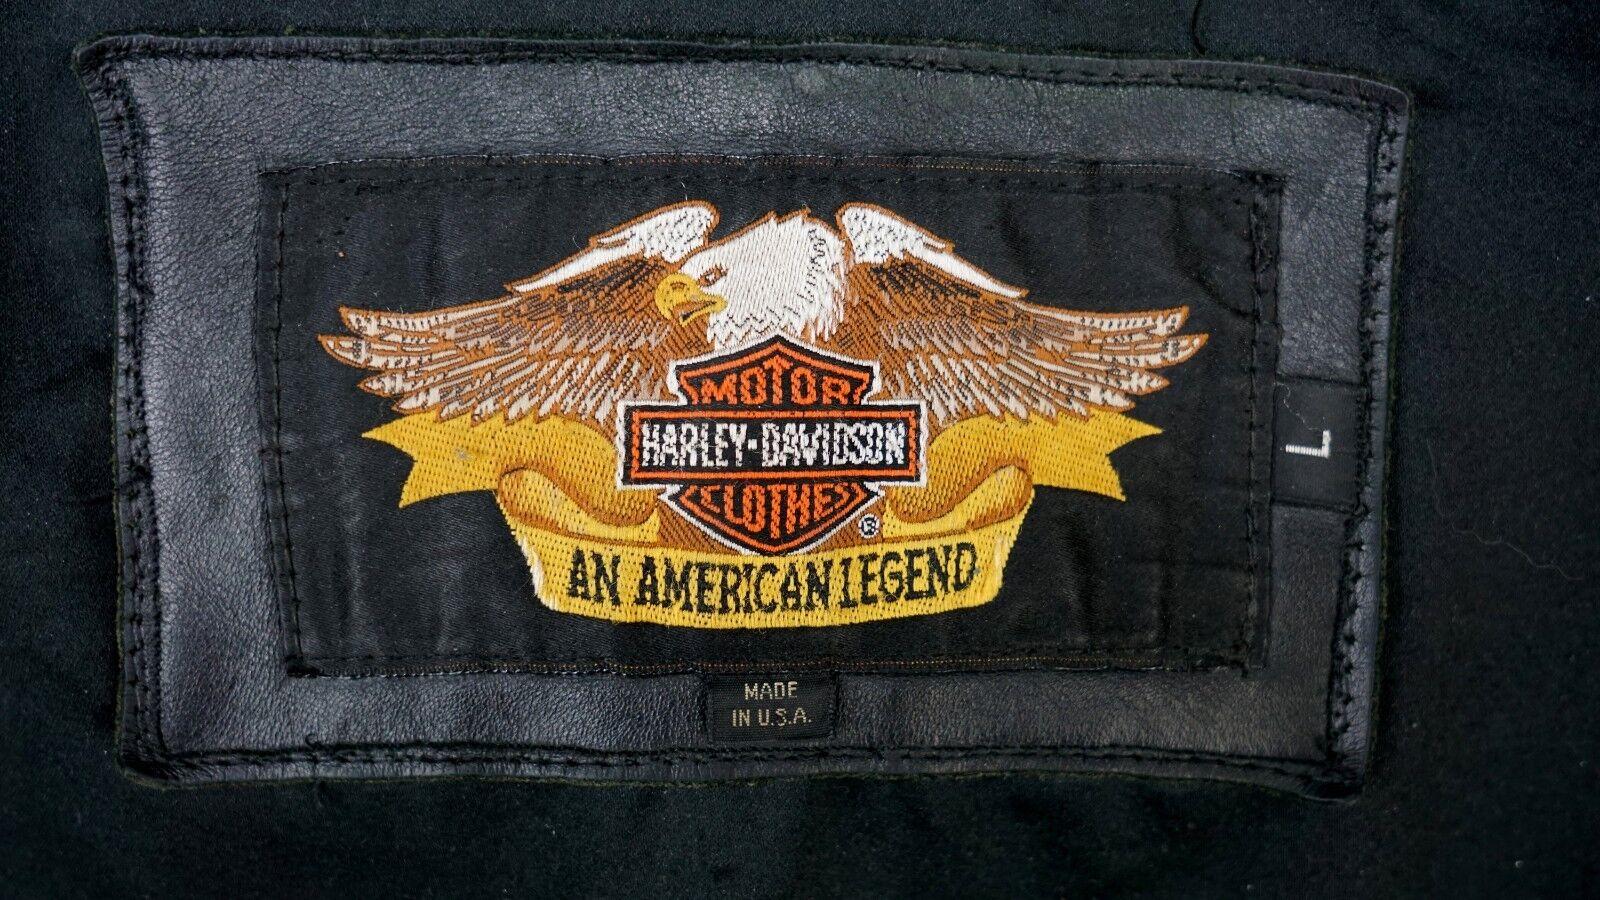 Harley Davidson Motard Moto en Veste en Moto Cuir Noir 52 L a88215